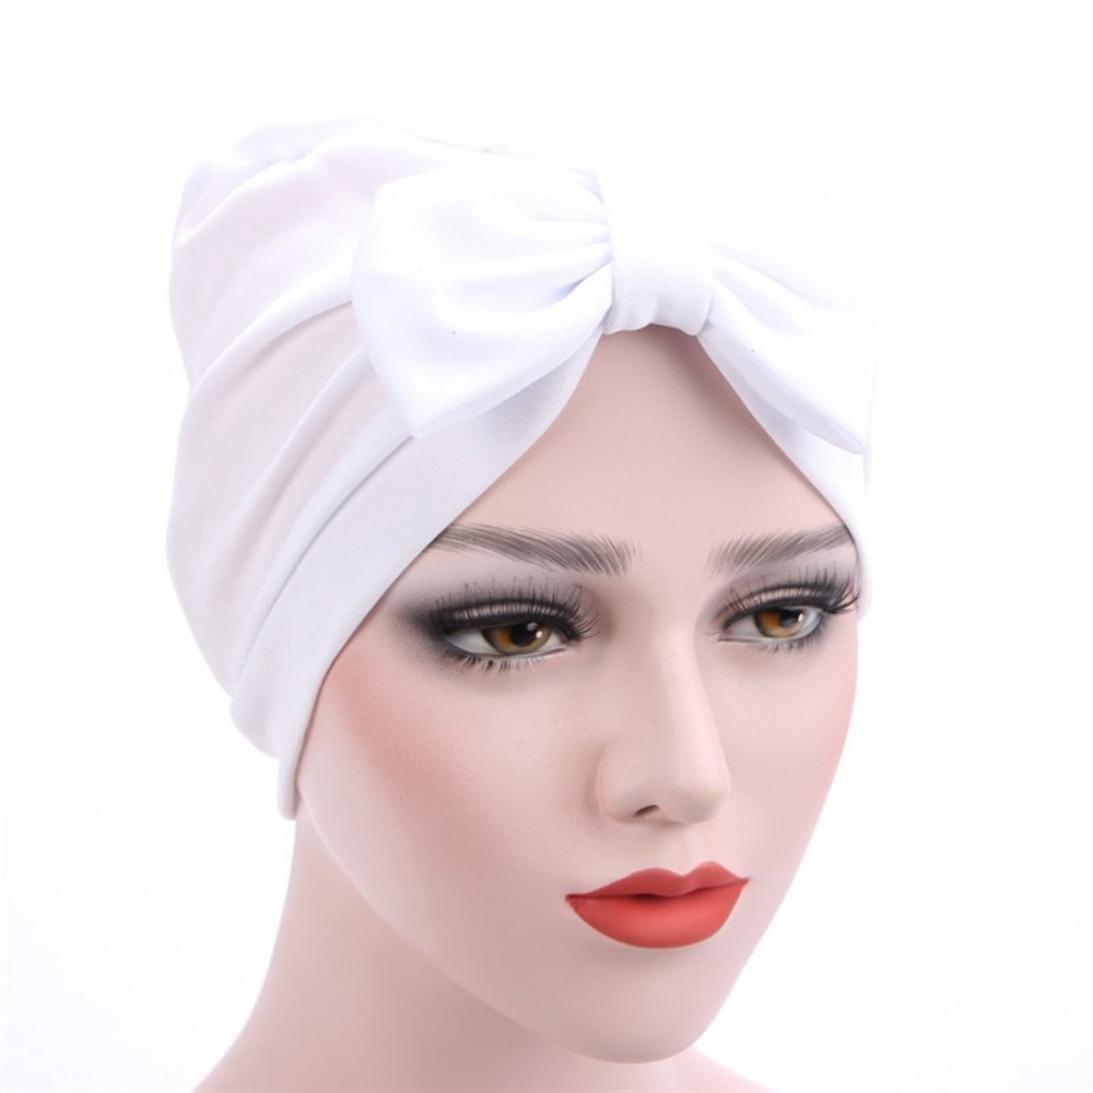 Purple Jaminy 2017 FASHION Women Cancer Chemo Hat Beanie Scarf Turban Head Wrap Cap Scarf Chemo Hat Turban Head Scarves Pre-Tied Headwear Bandana Tichel for Cancer